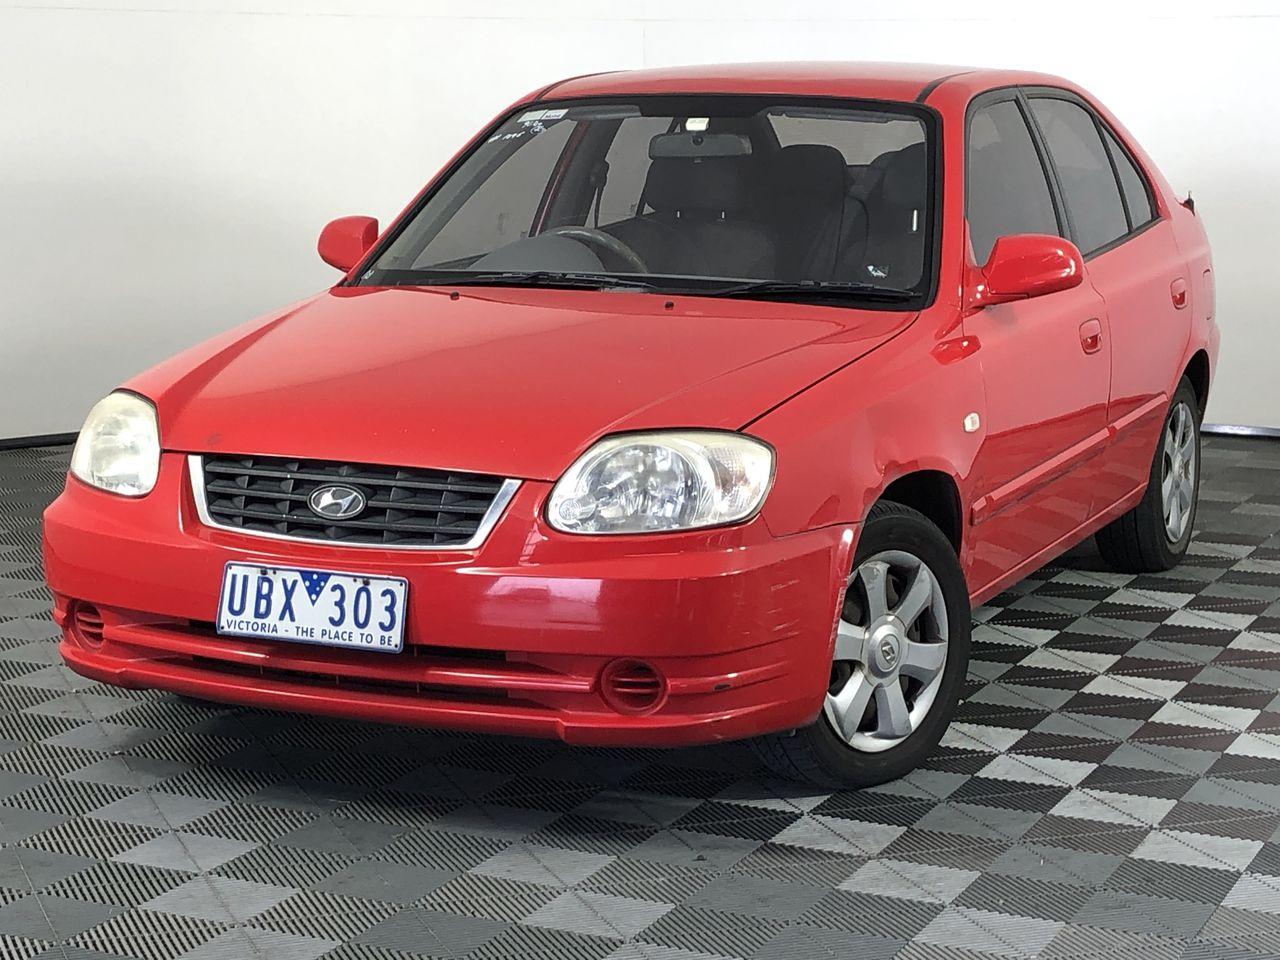 2004 Hyundai Accent 1.6 LS Automatic Hatchback